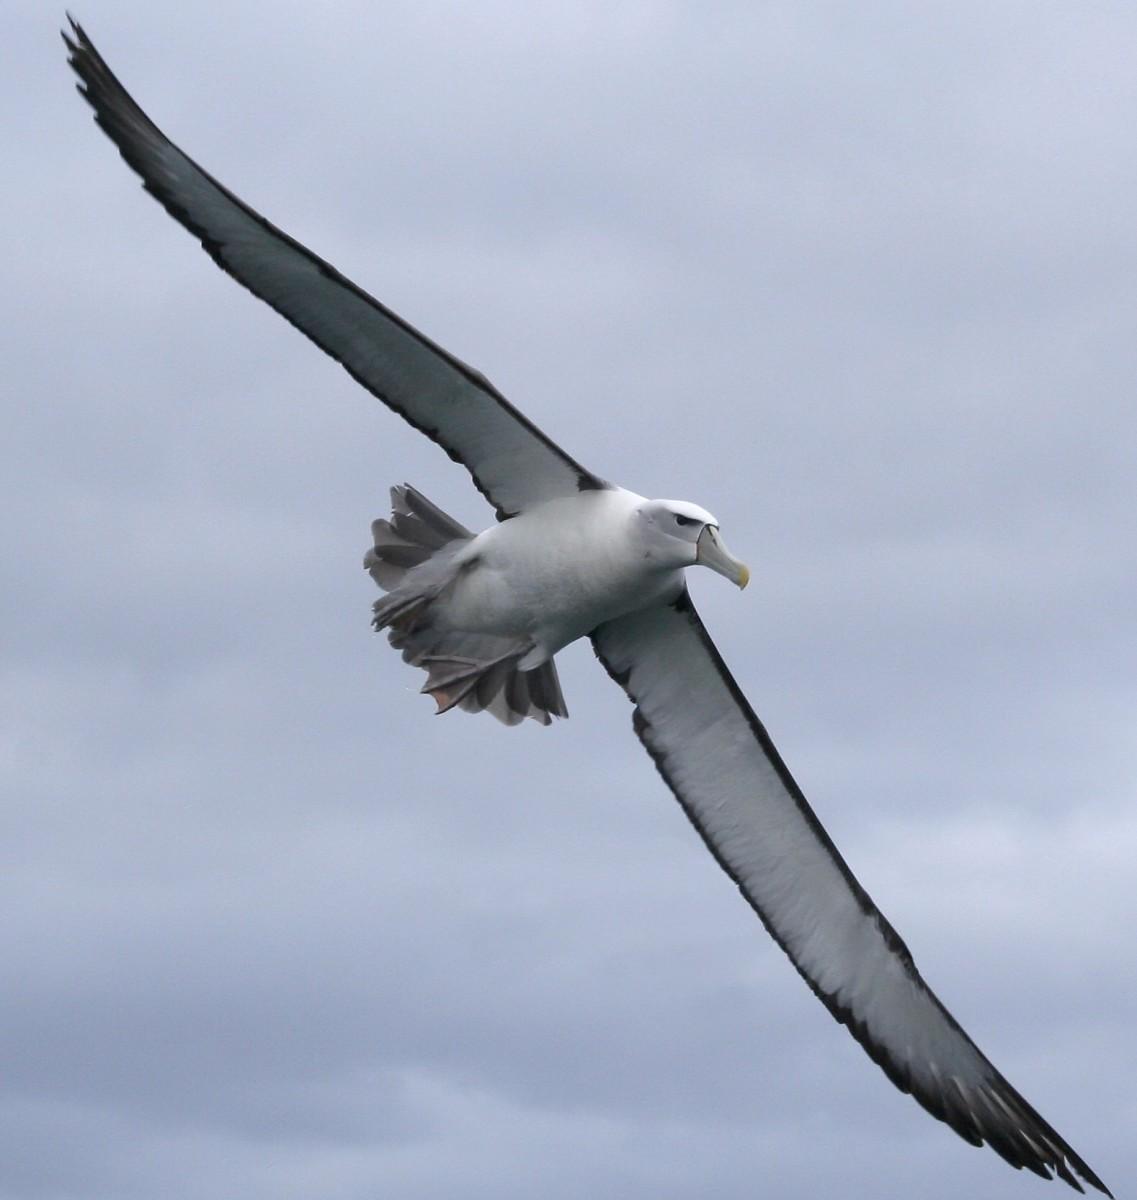 Wandering White Albatross